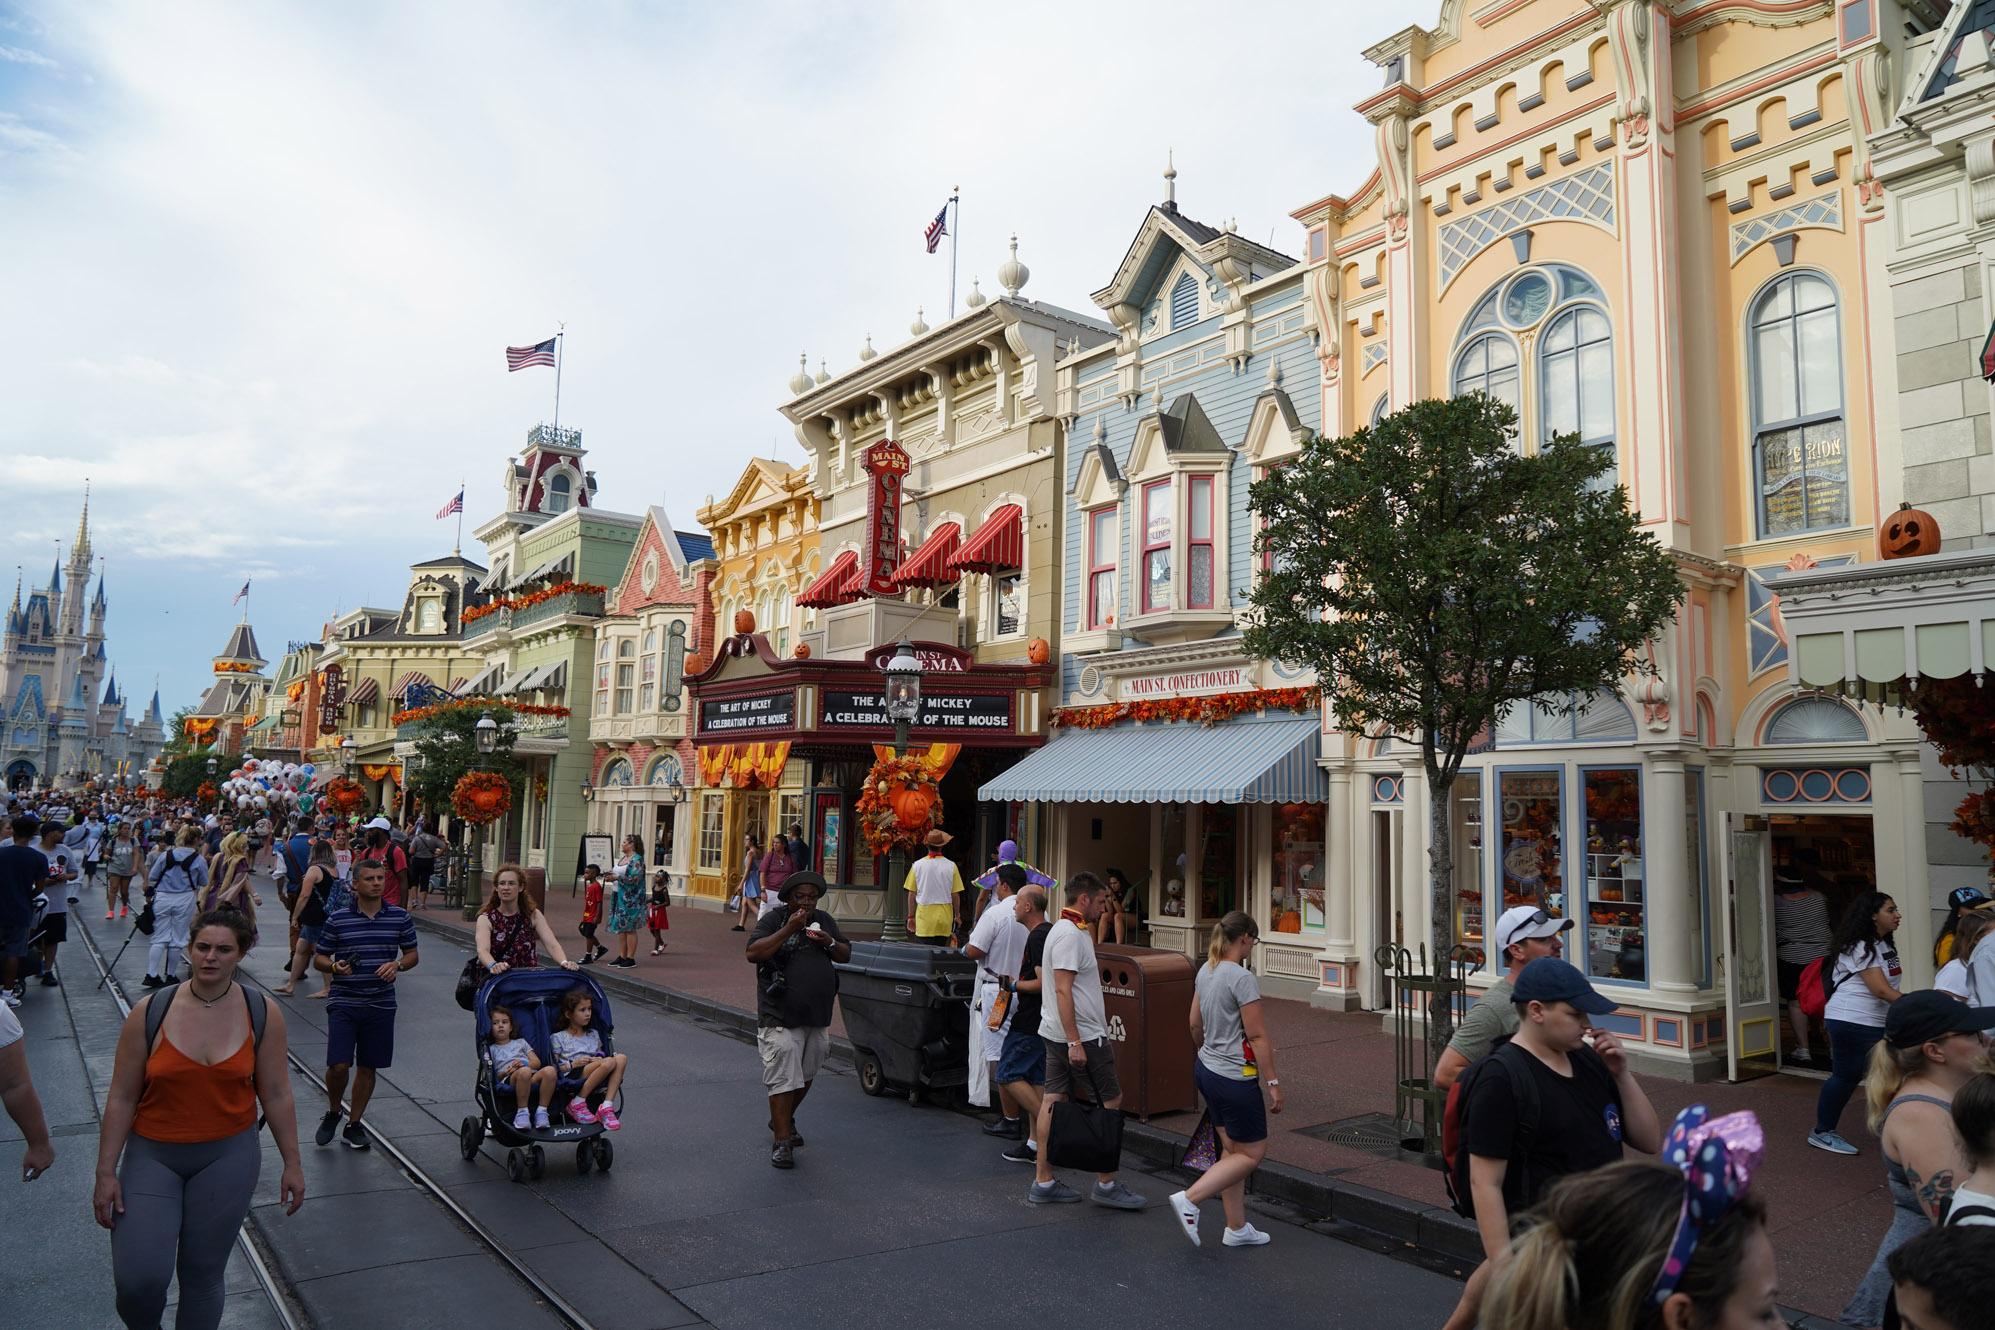 [%Disney World Map [2021 Maps: Resorts, Theme Parks, Water|2021 Rides In Disney World|2021 Rides In Disney World%]